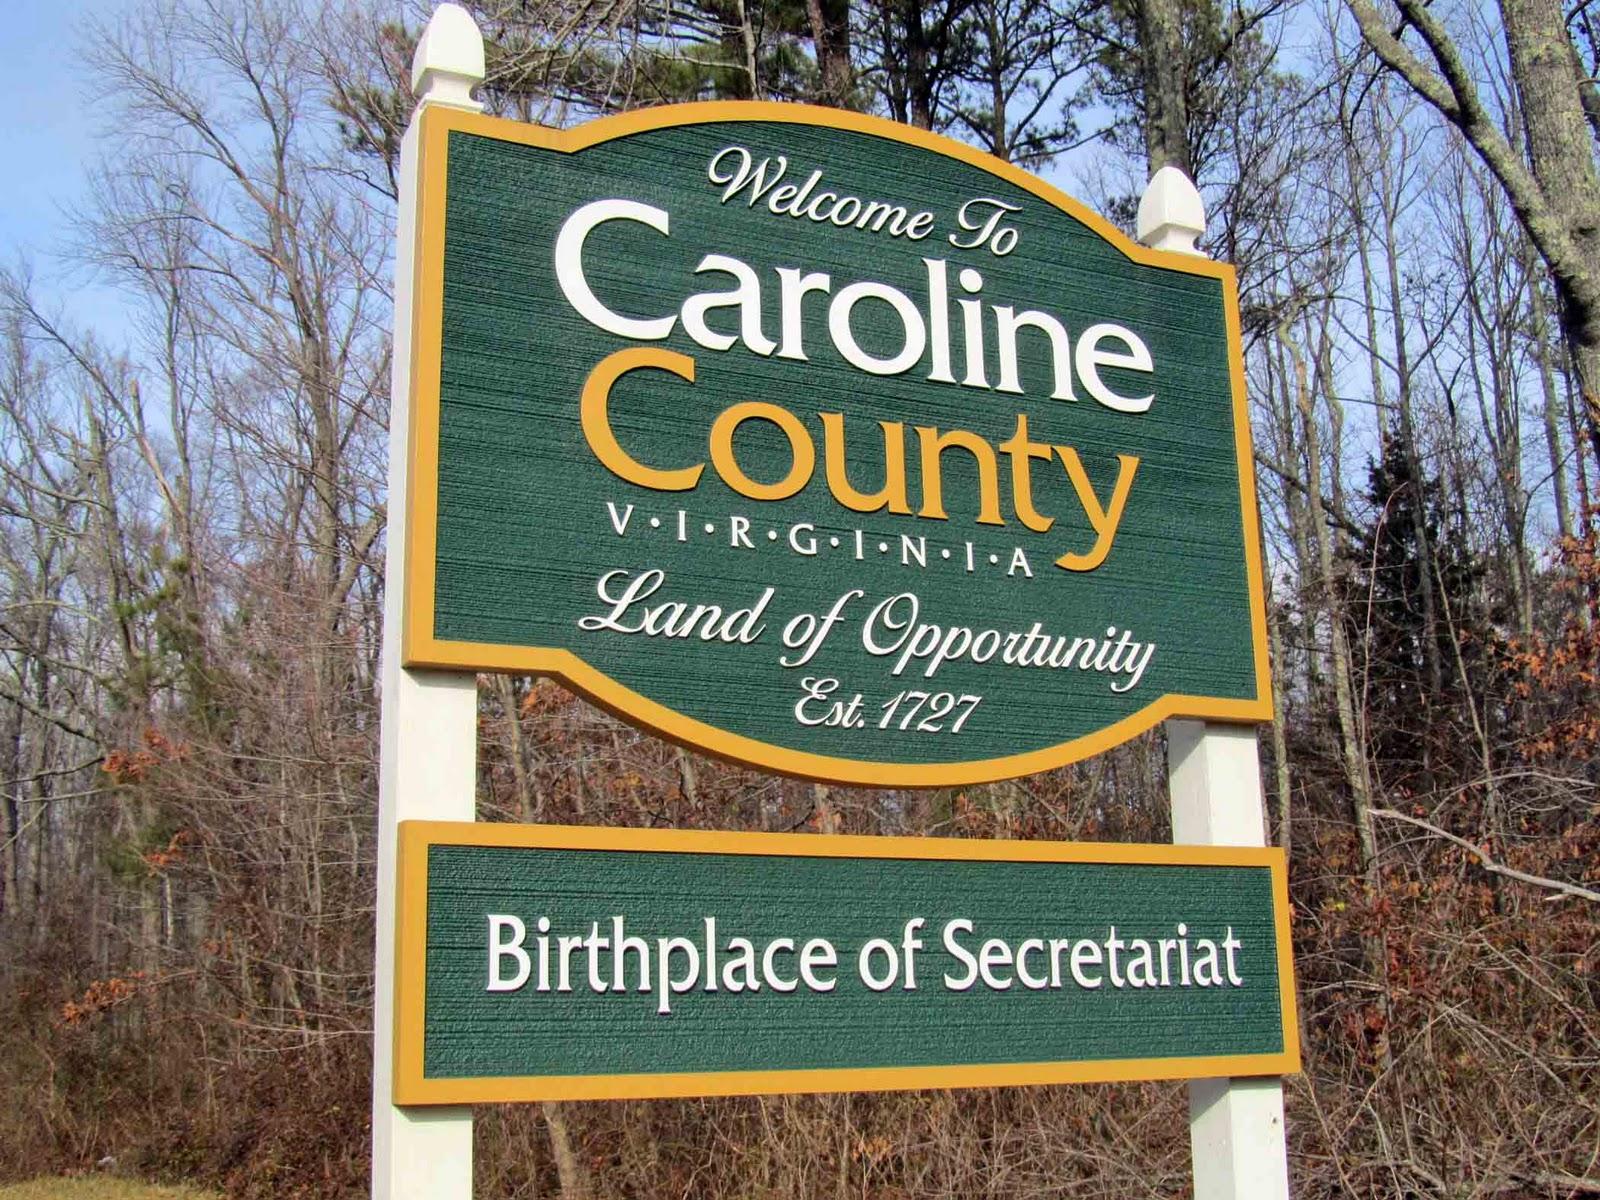 Caroline County